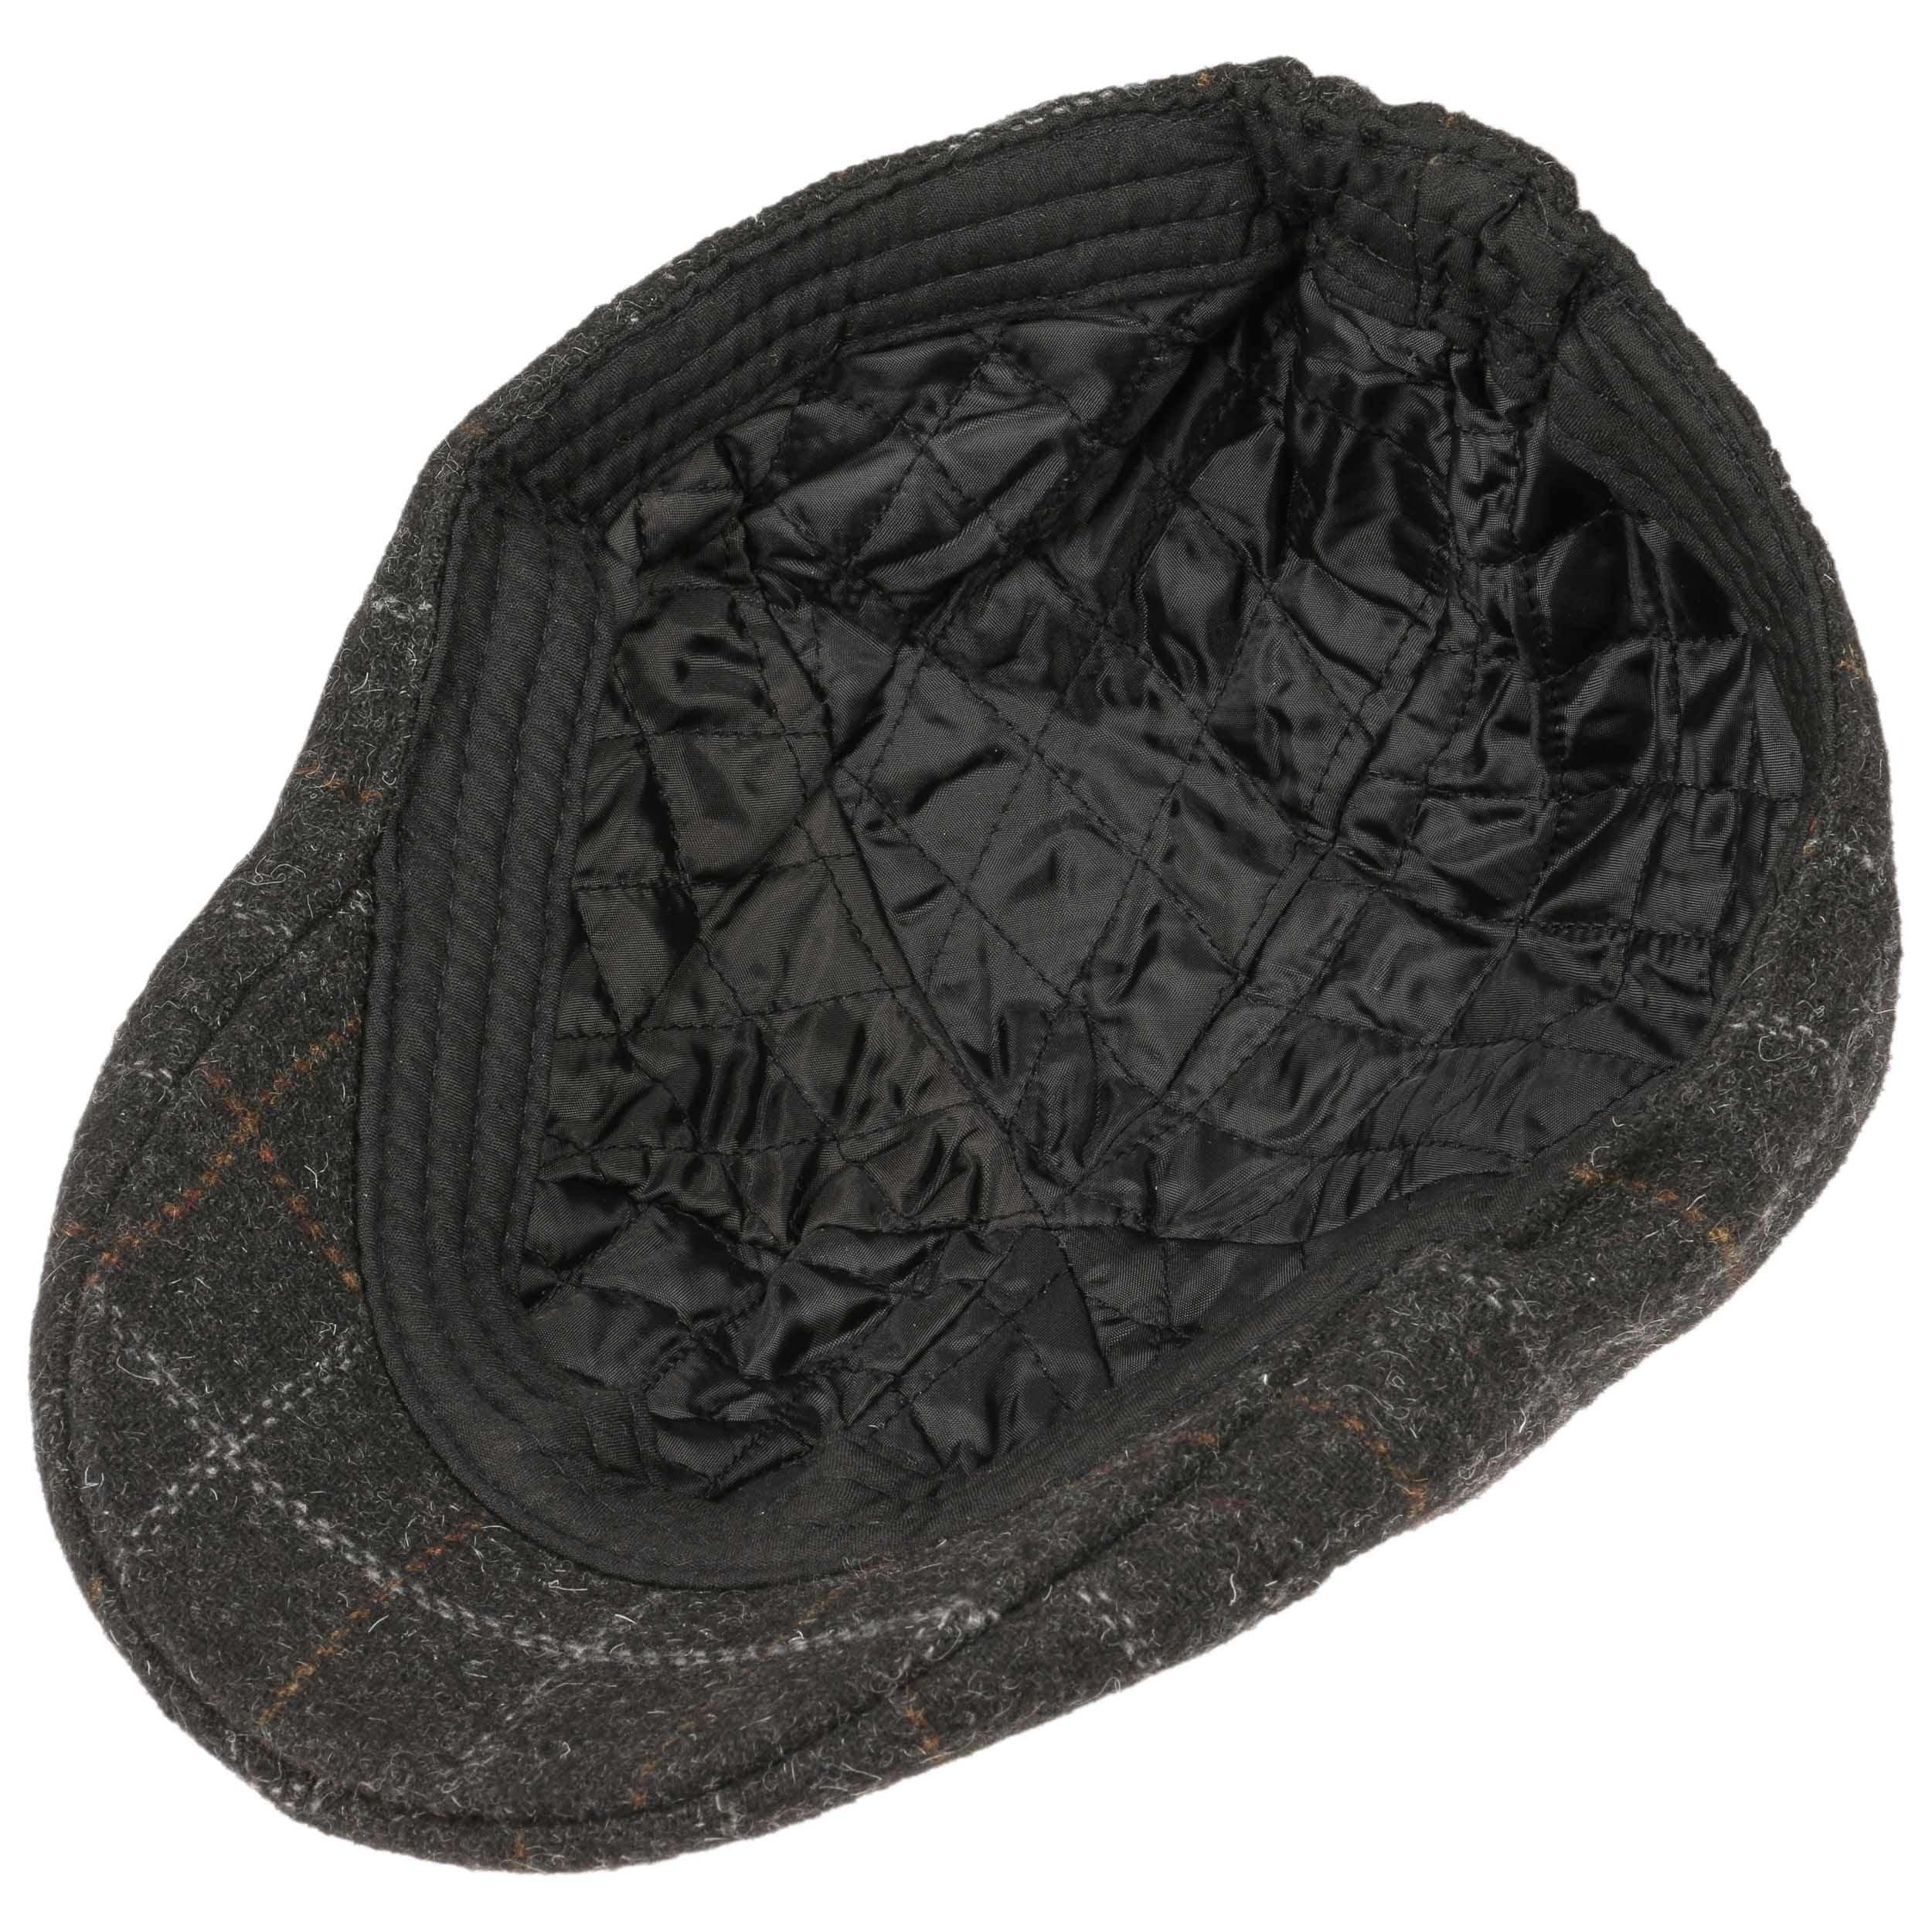 Gorra de Hombre Checked by Lipodo - Gorras - sombreroshop.es ac780285c73